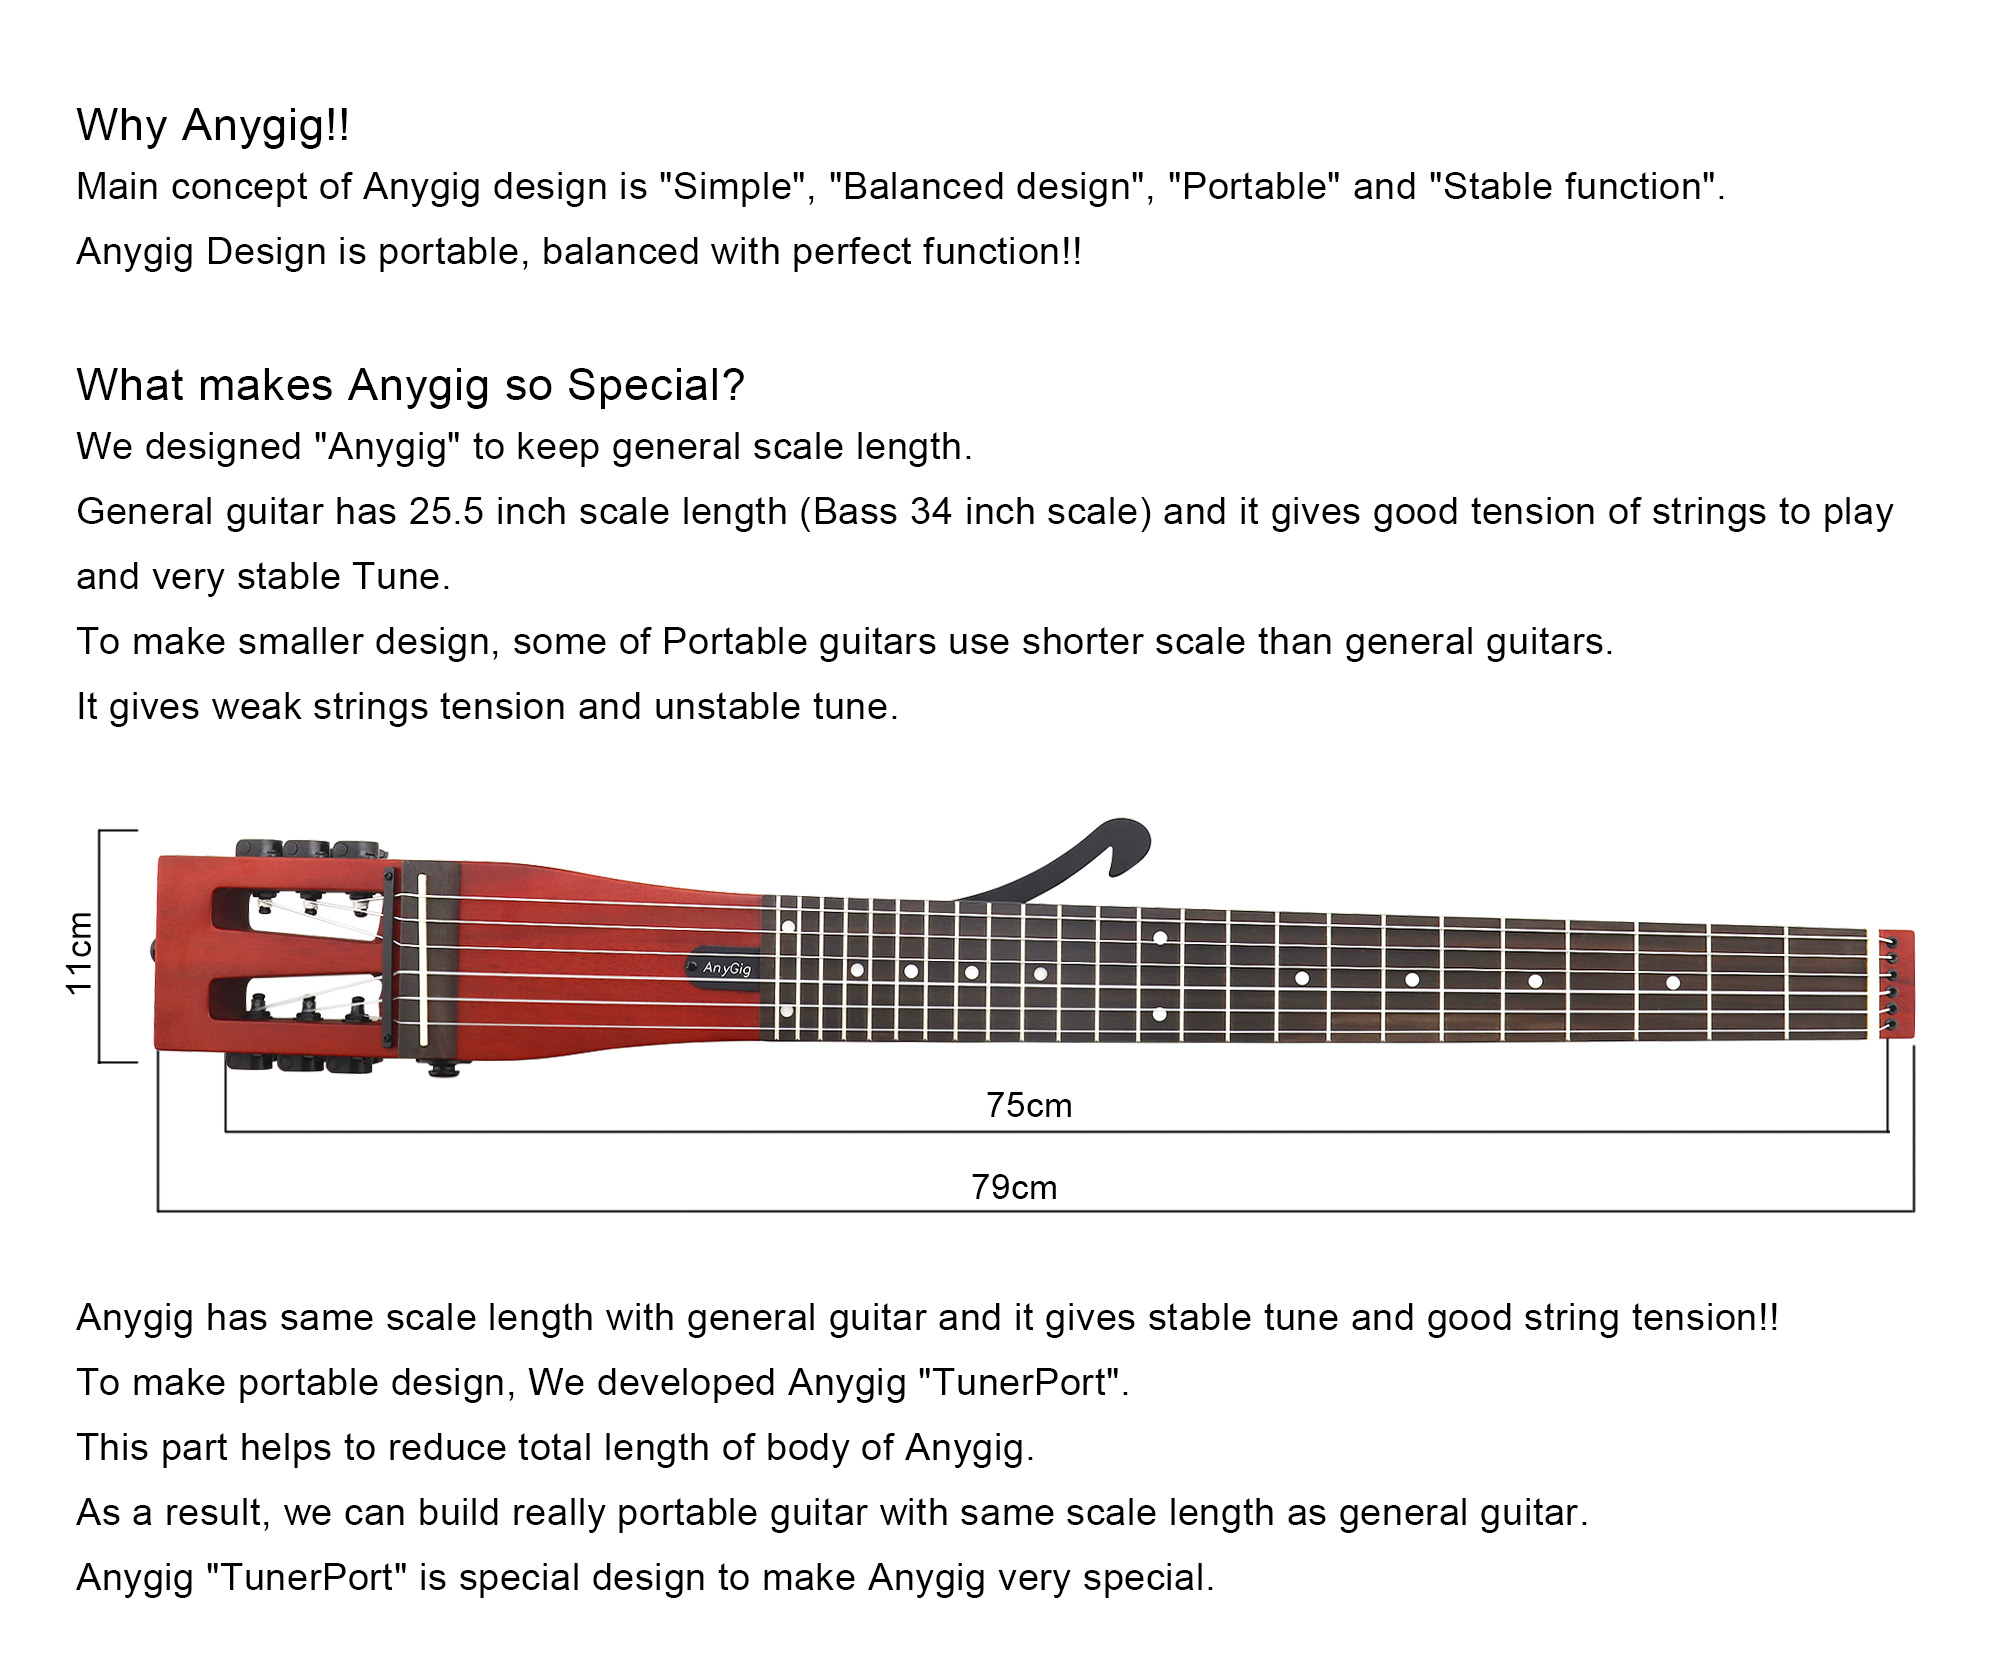 anygig agnse nylon string full scale length classical type traveler guitar w bag 786862963881 ebay. Black Bedroom Furniture Sets. Home Design Ideas